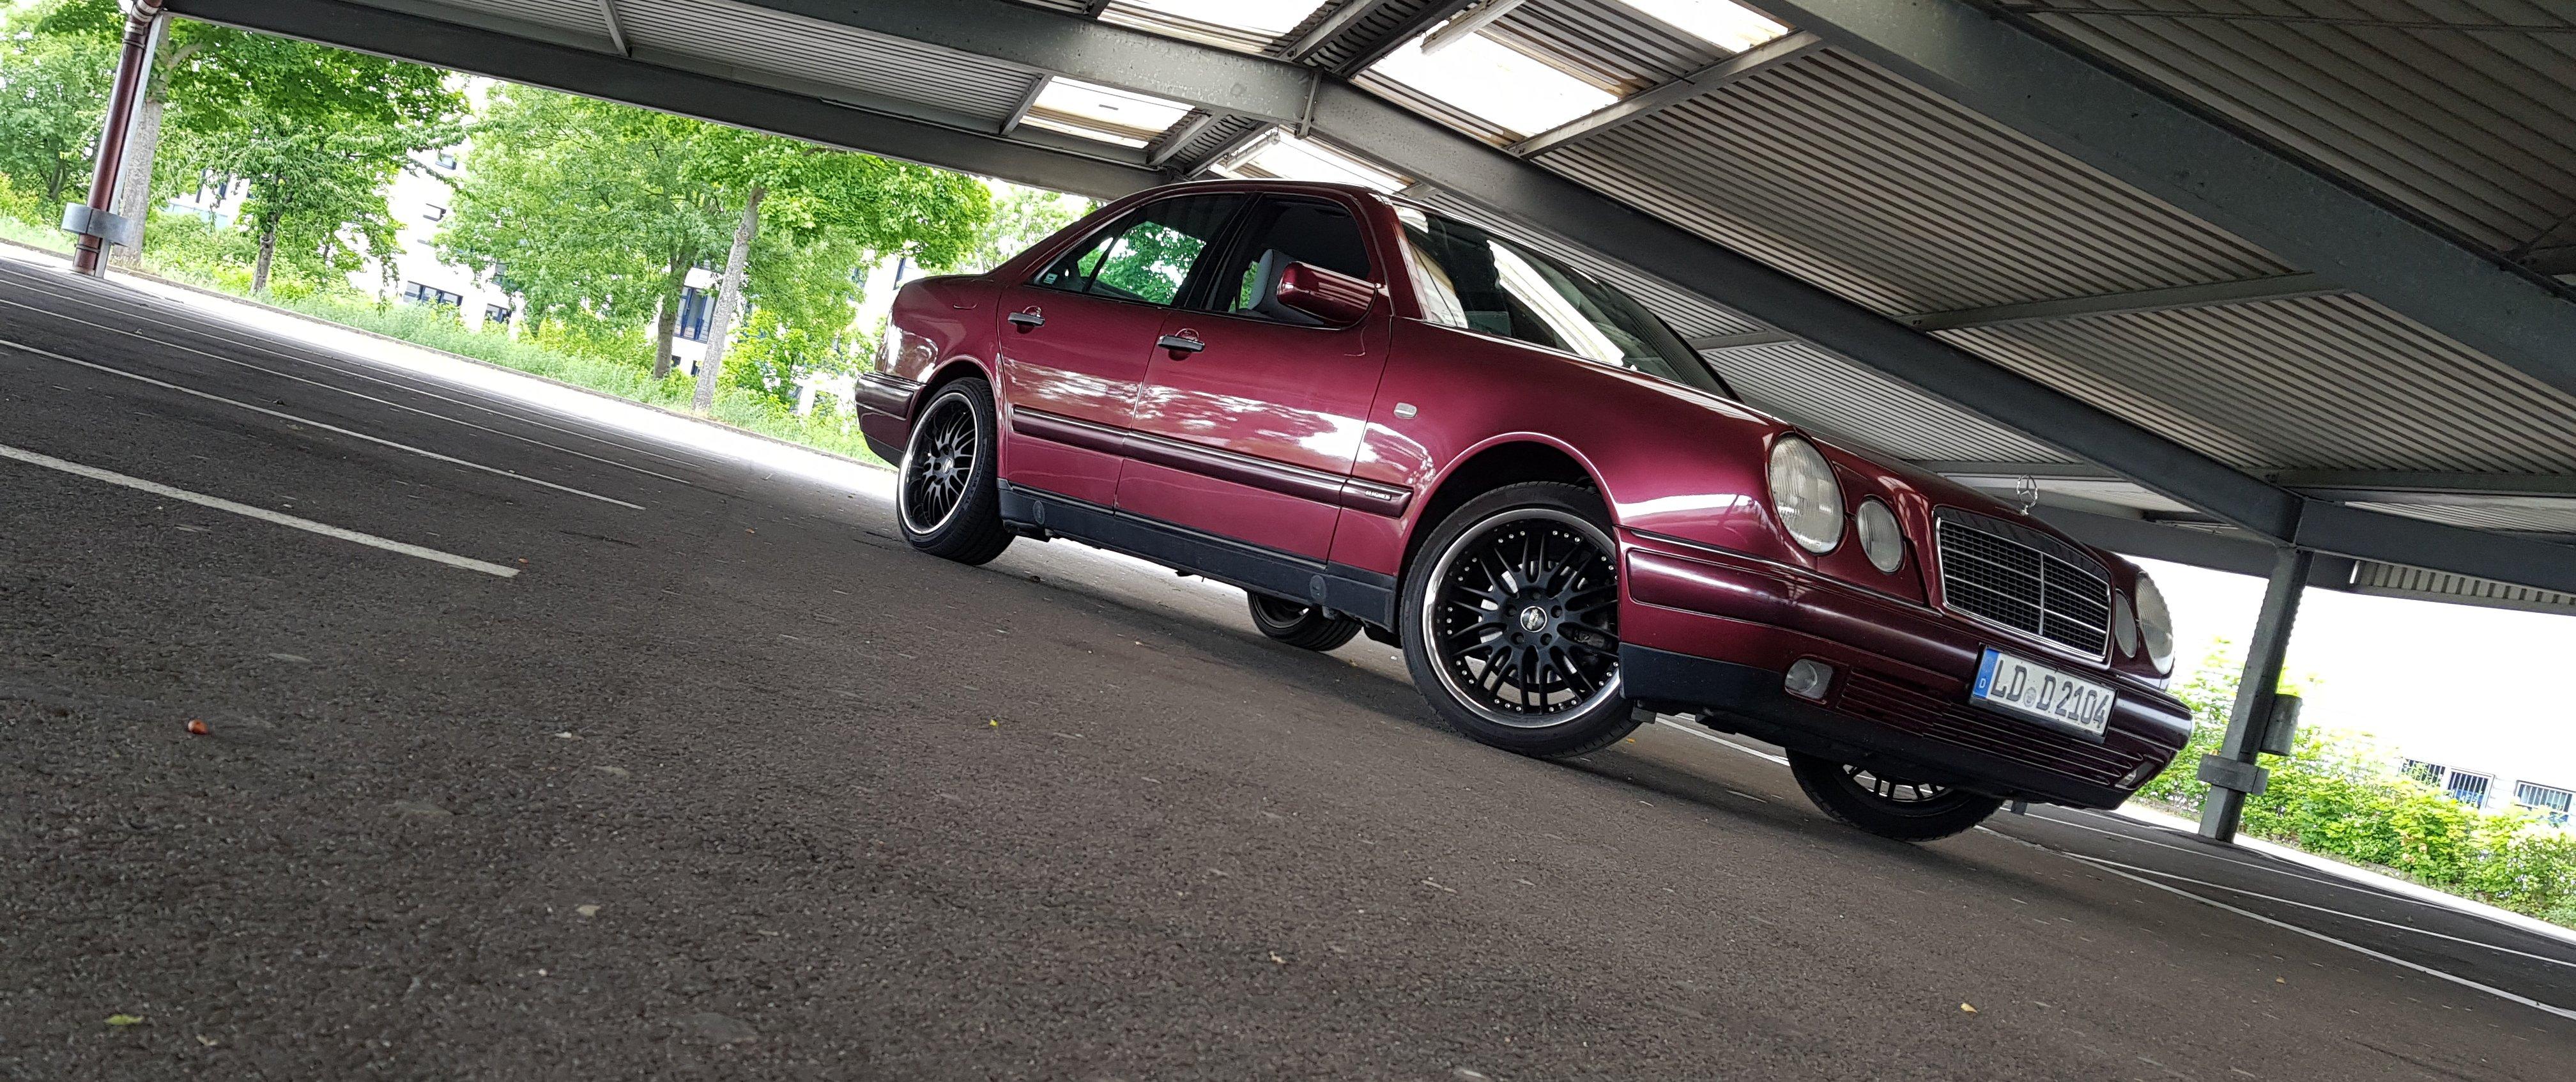 Mercedes-Benz – E-Klasse – ORIGINAL MERCEDES-BENZ – Royal GT – Anthrazit – 18 Zoll